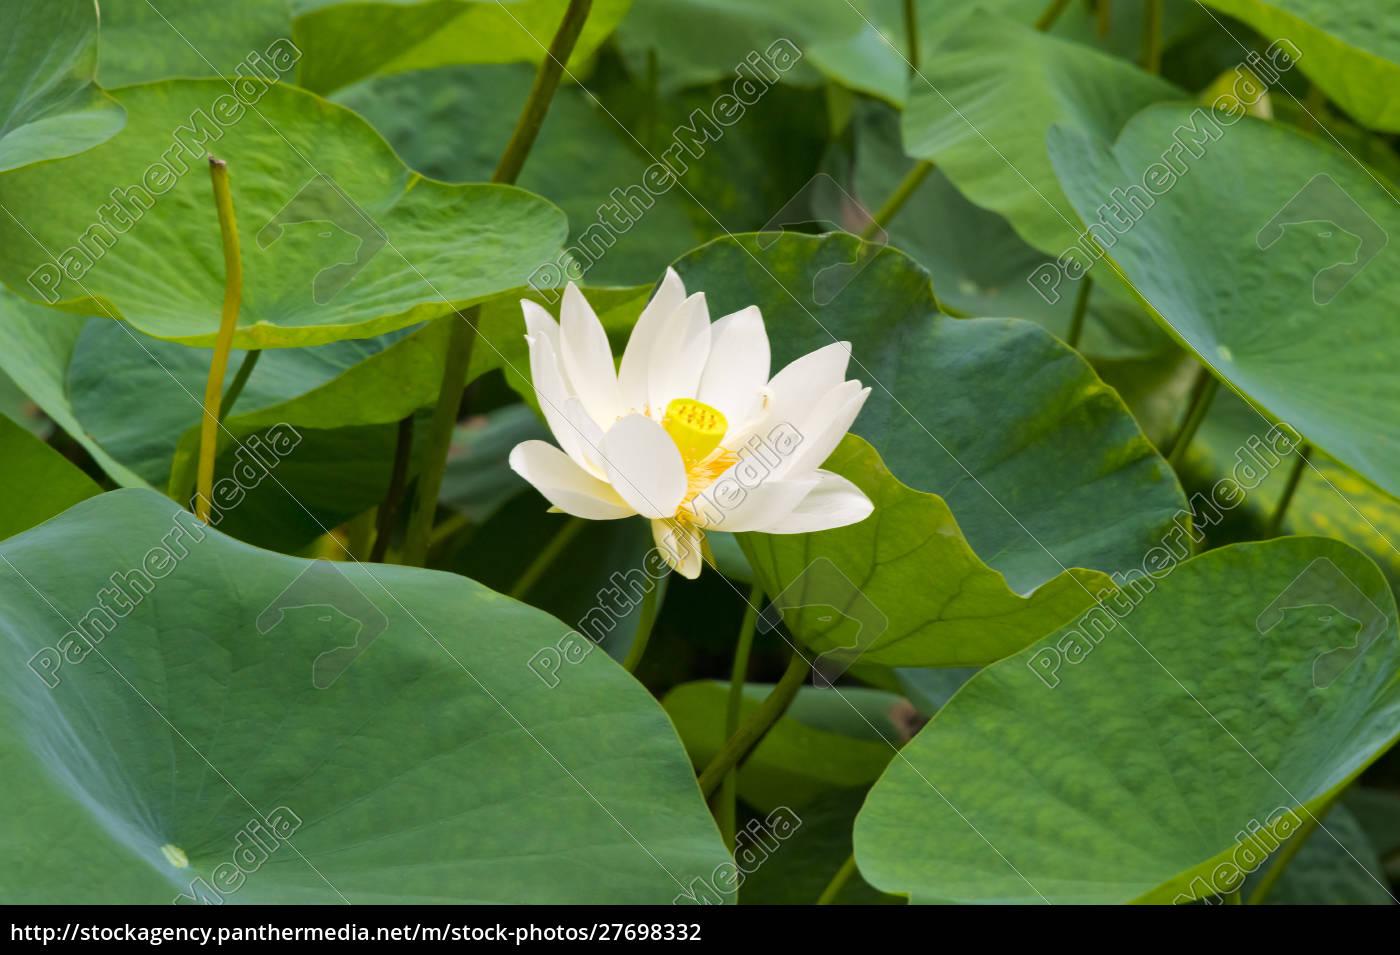 lotusblume, china - 27698332